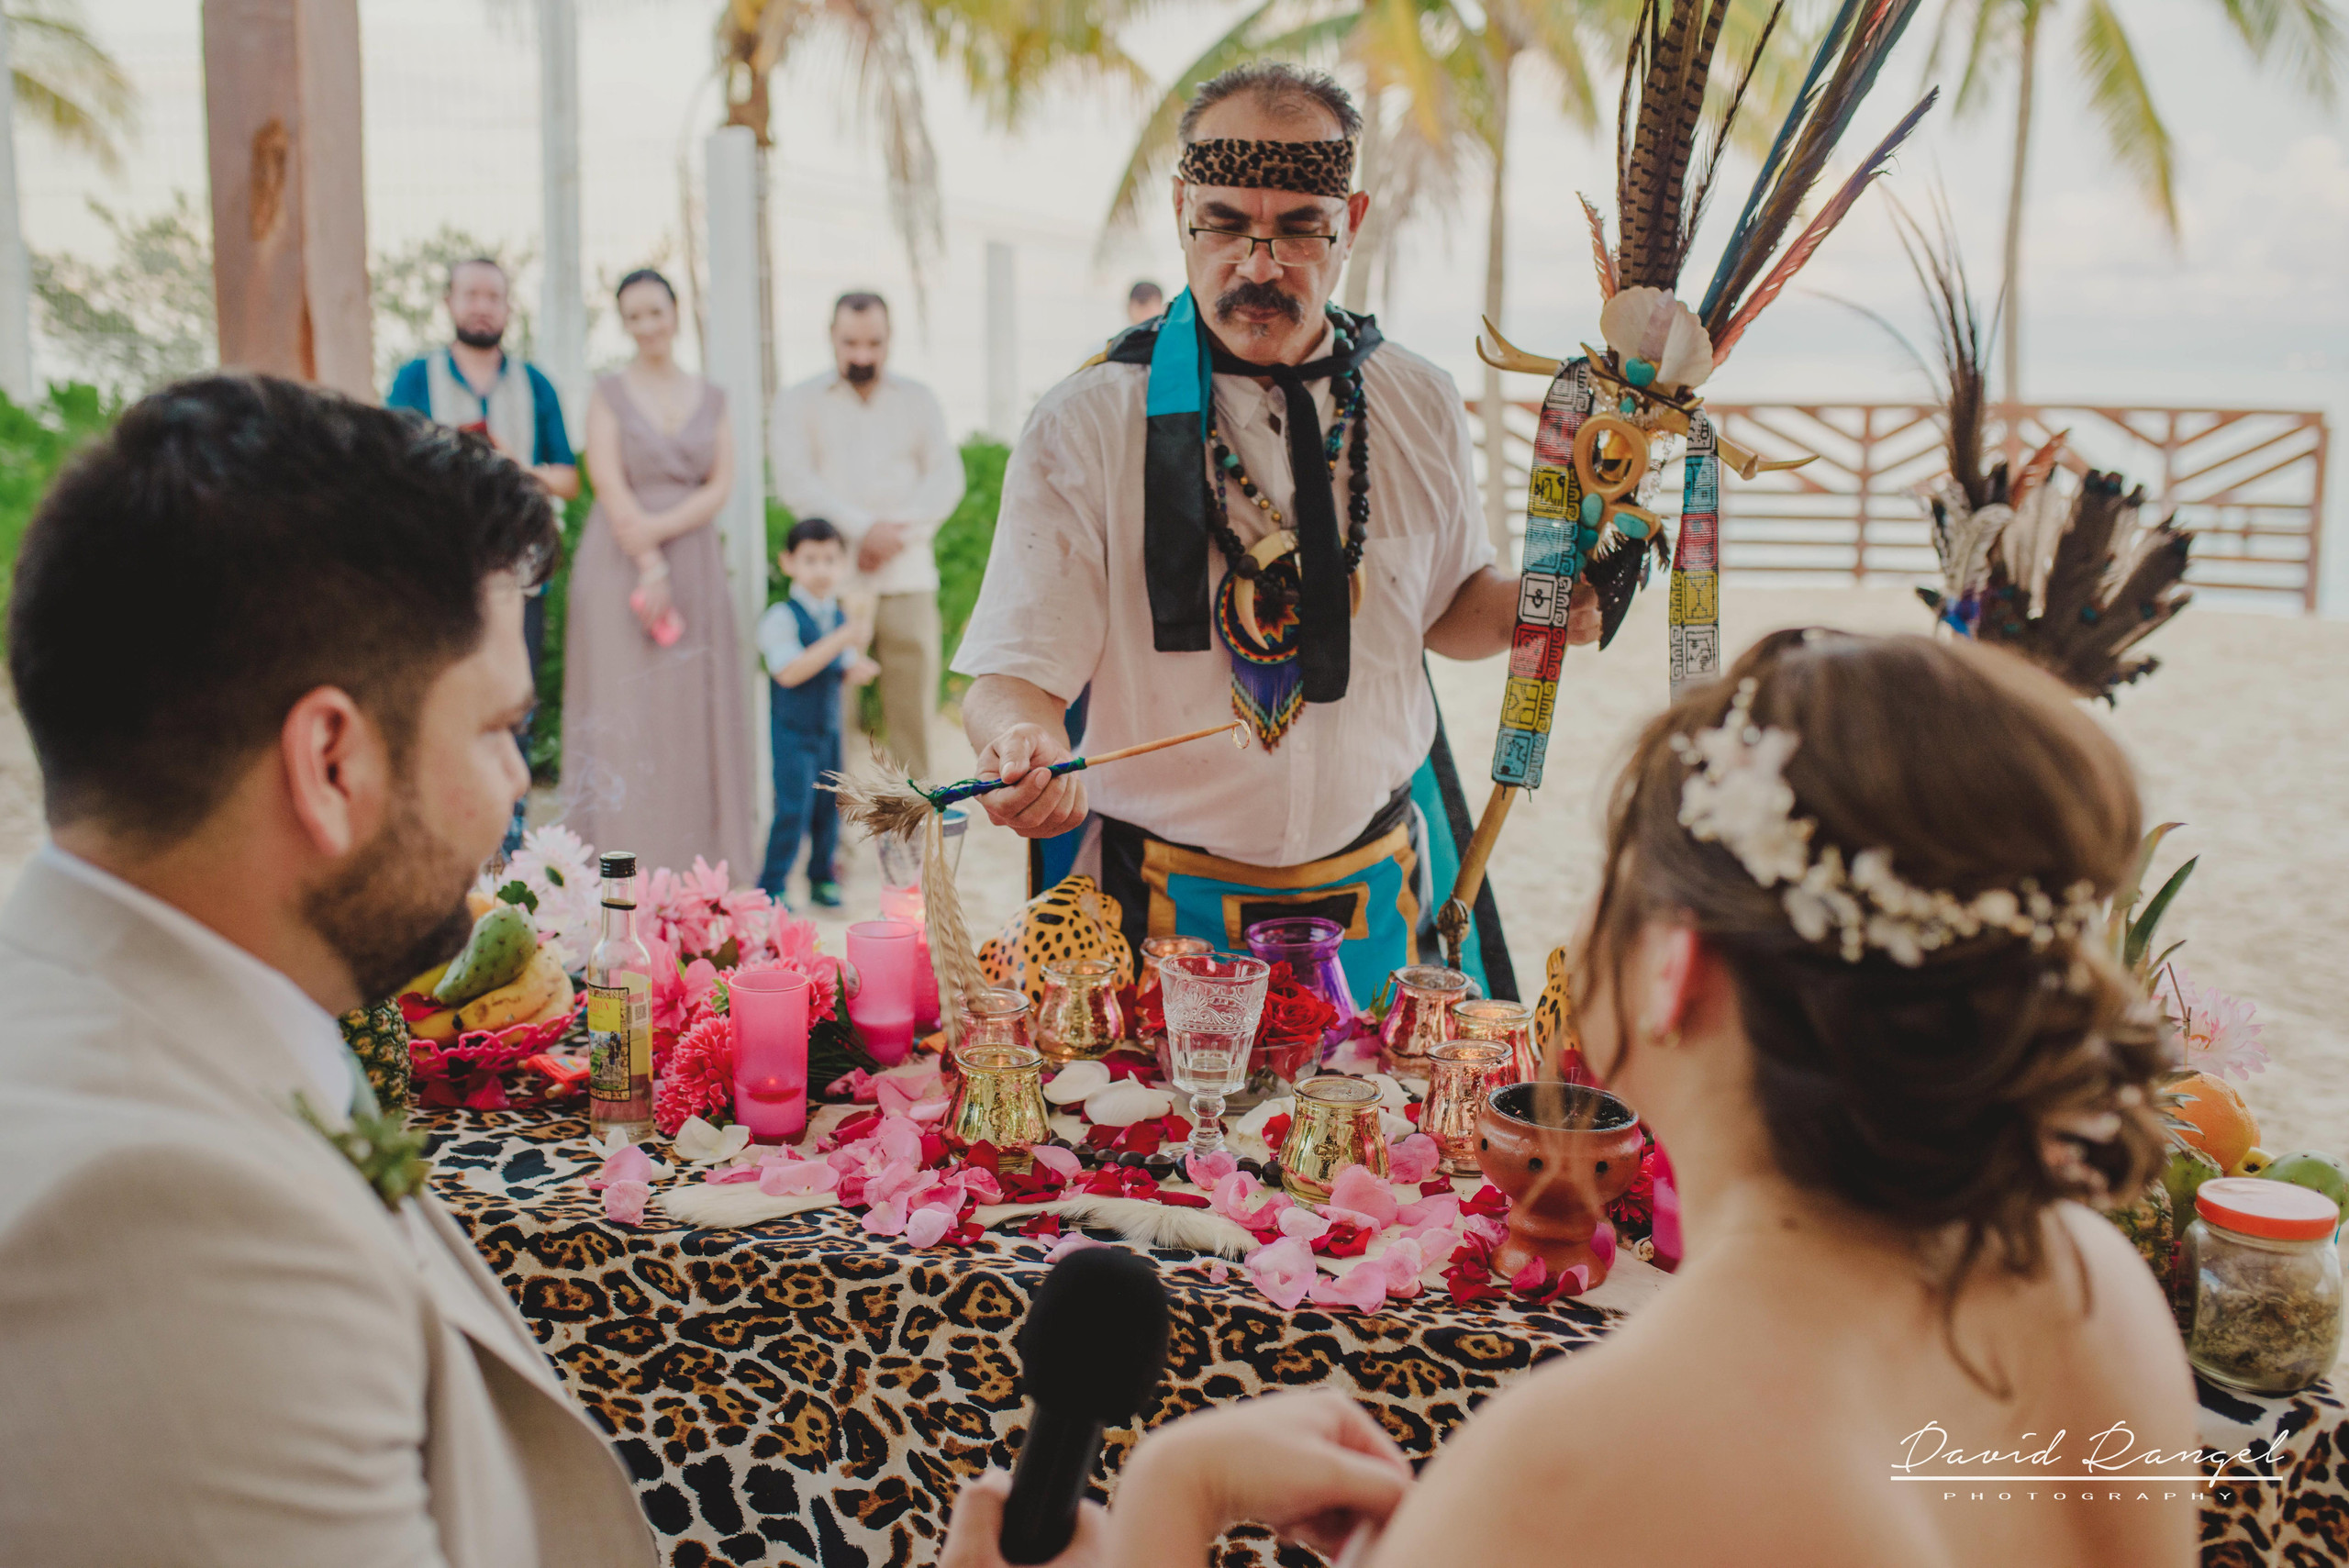 groom+bride+wedding+ceremony+dress+villa+chenera+isla+blanca+costa+mujeres+garden+beach+chaman+traditional+mayan+wedding+gazebo+ring